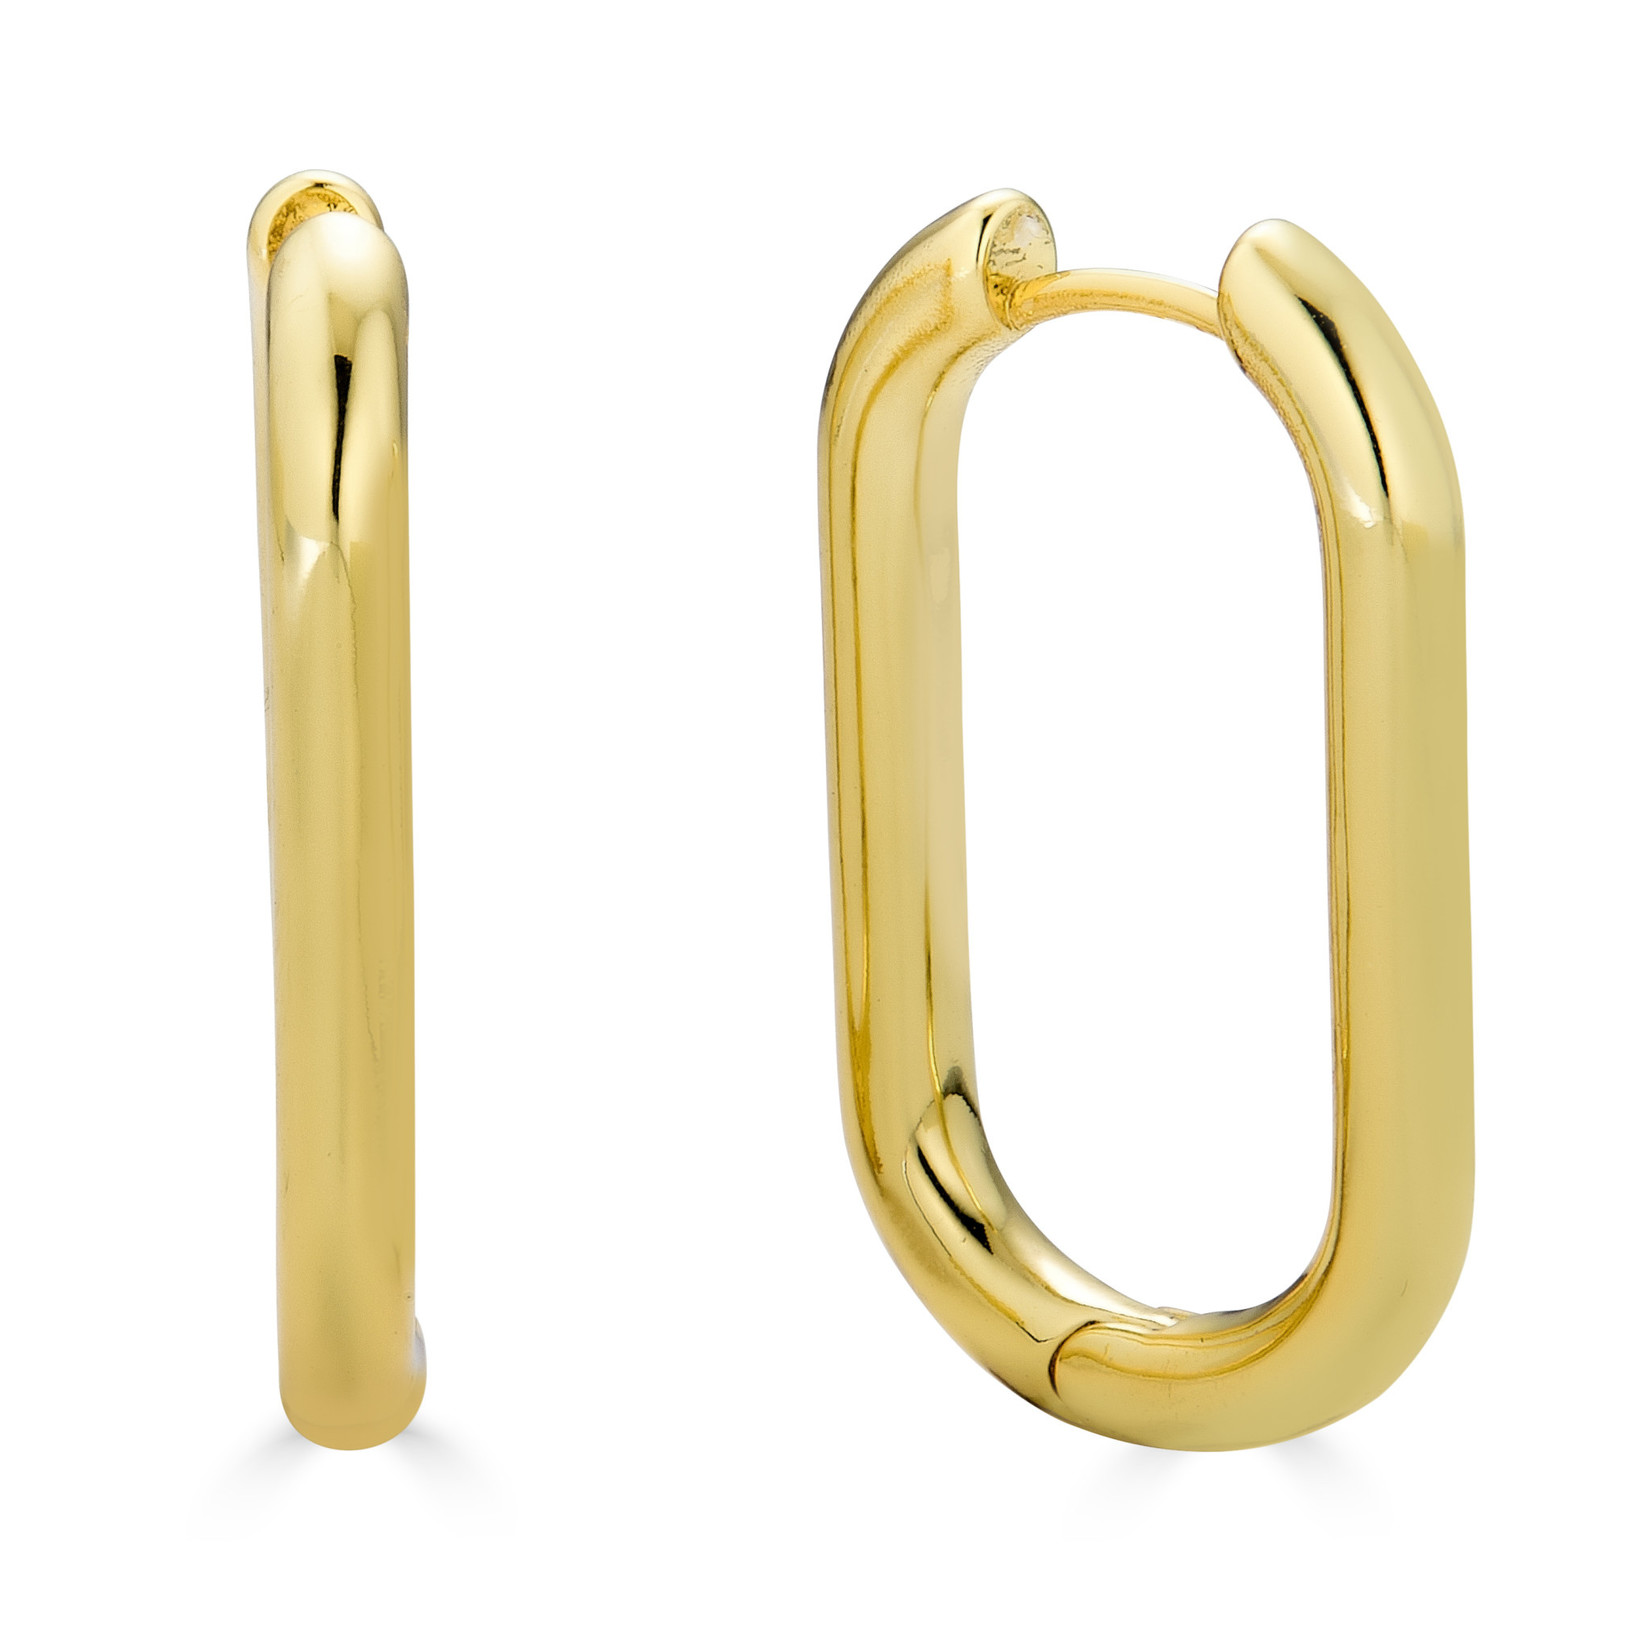 Rendor Marina Rectangle Earrings